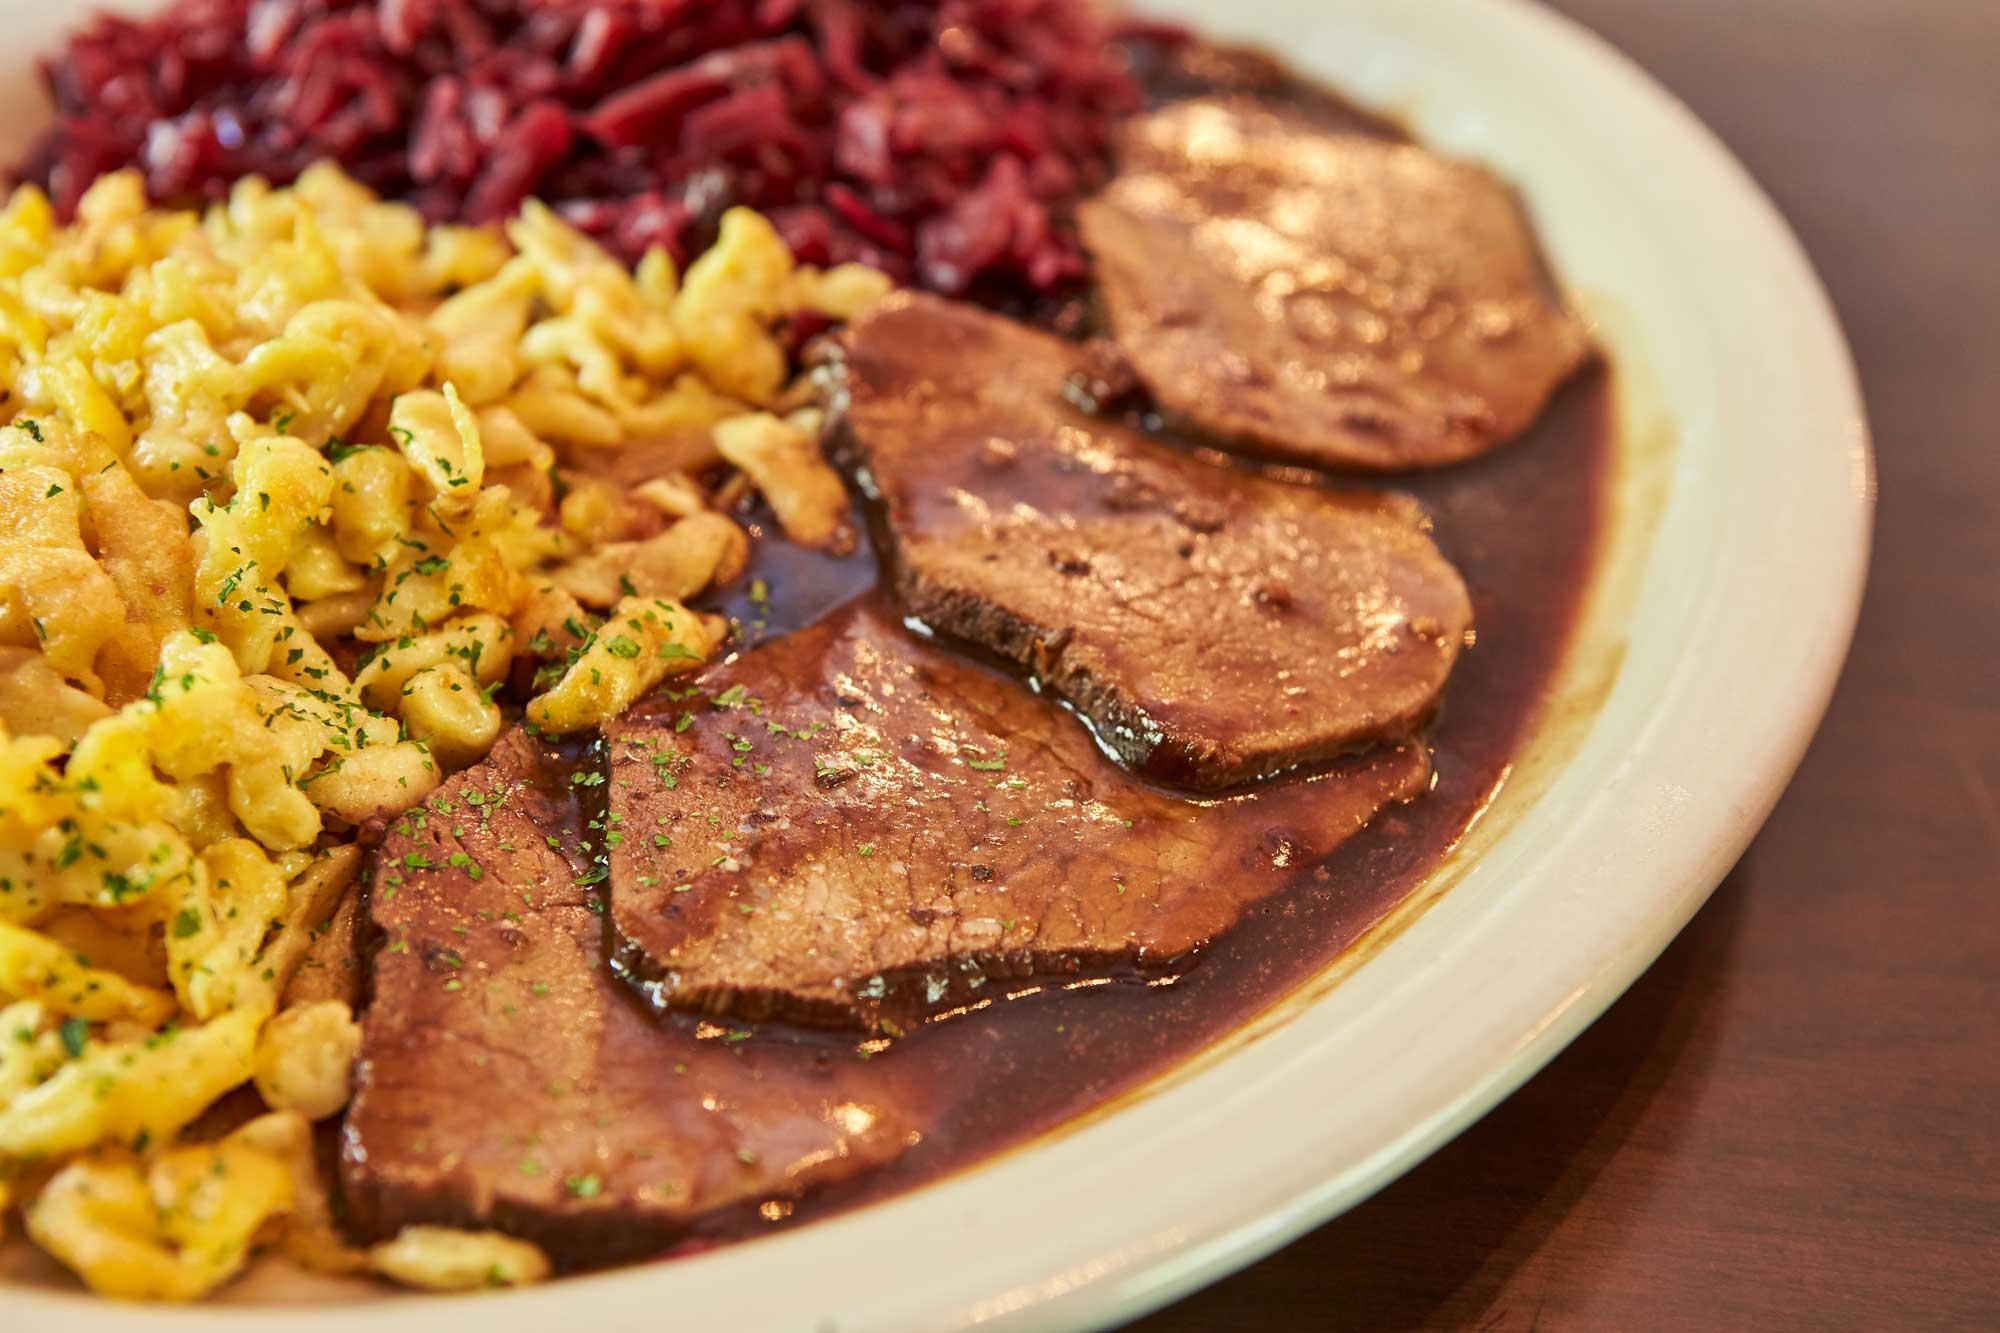 Heidelberg German Restaurant Food Menu Spaetzle Red Cabbage Sauerbraten